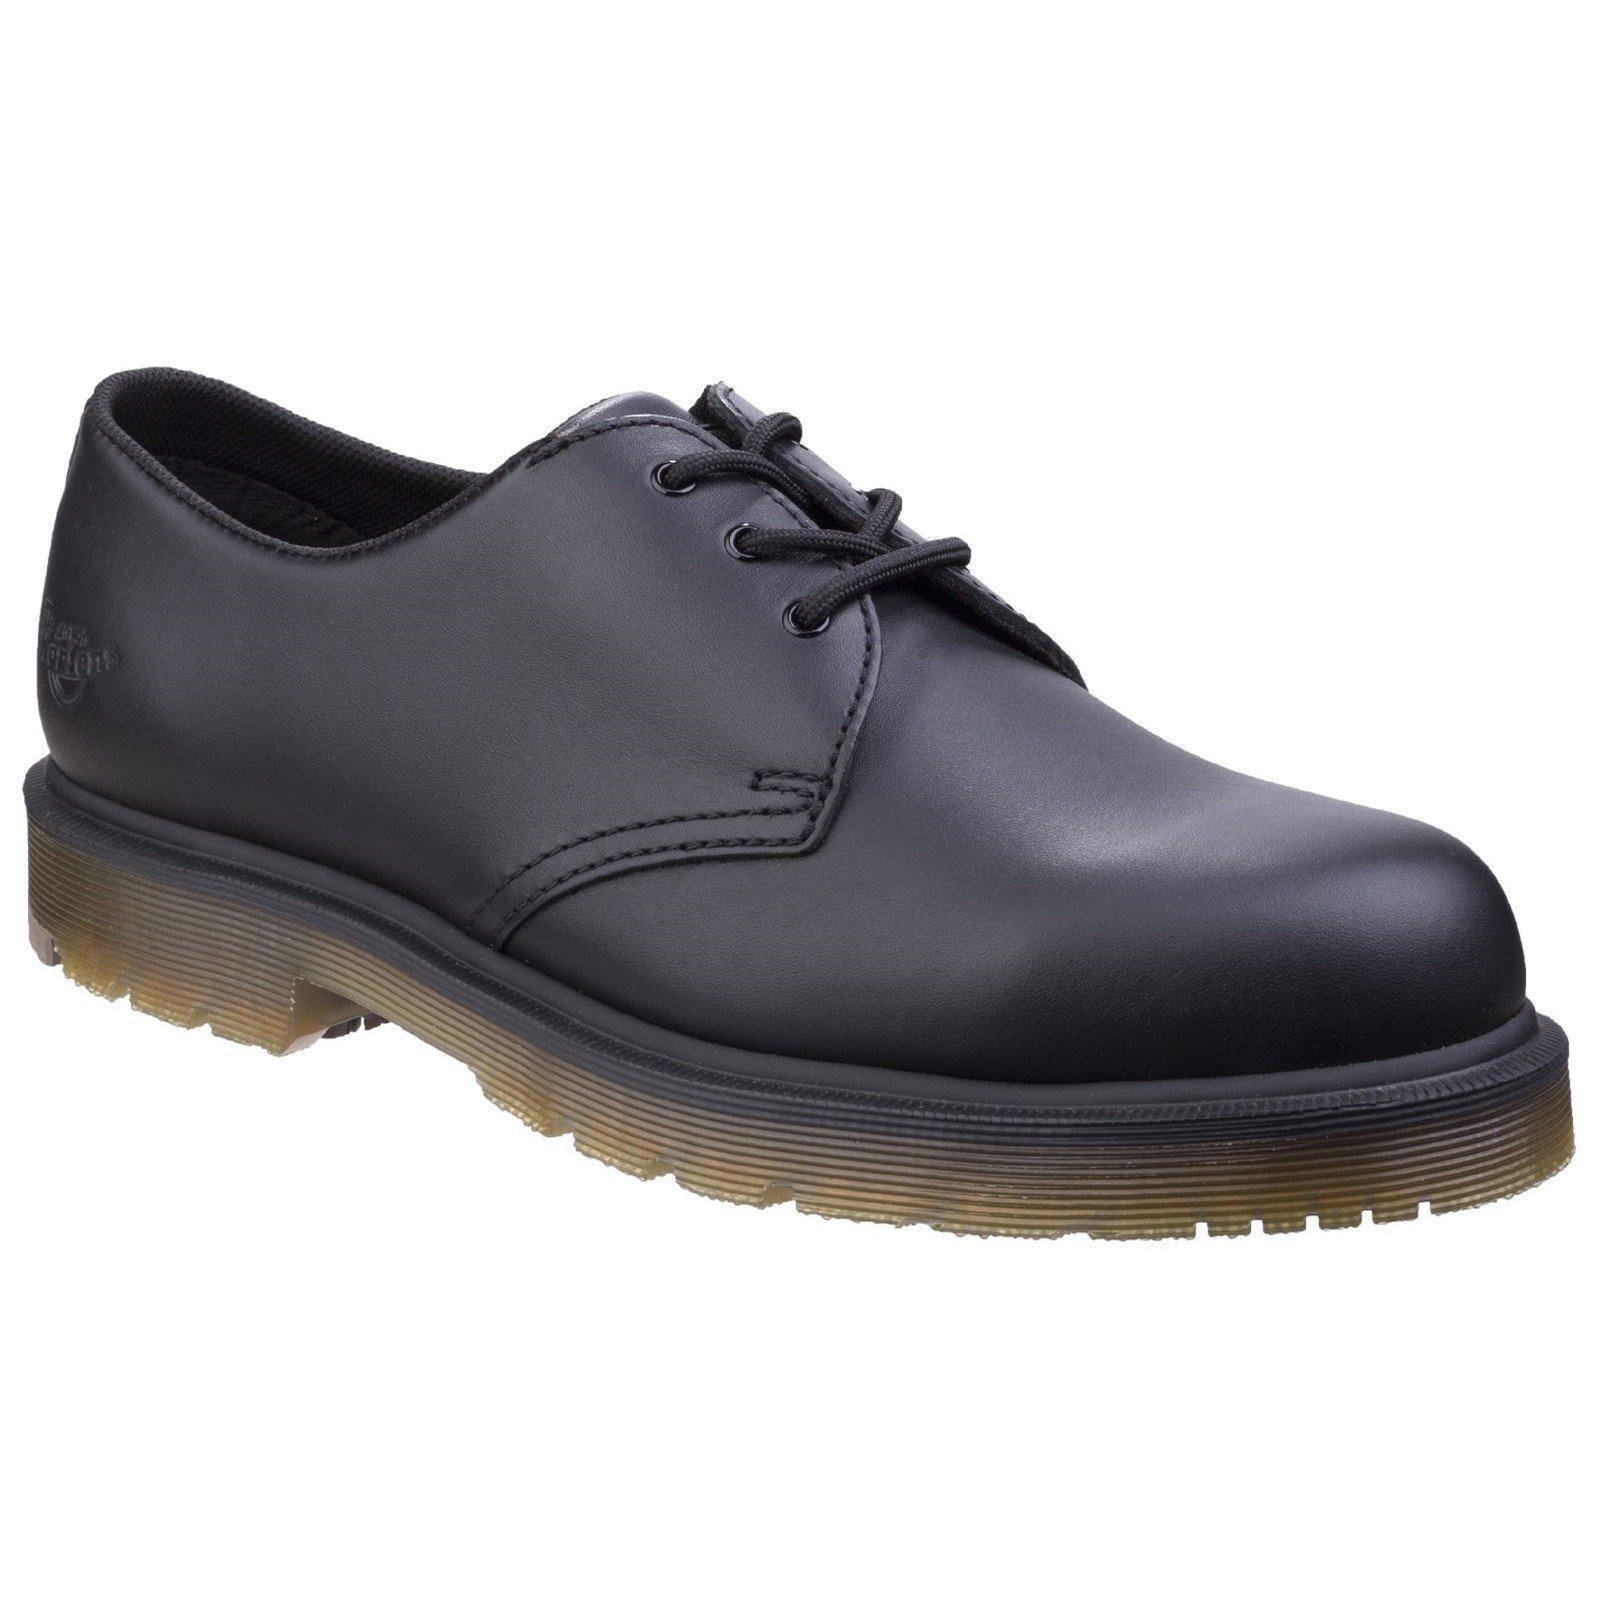 Dr Martens Men's Arlington NS Derby Shoe Black 26781 - Black Industrial Full Grain 5